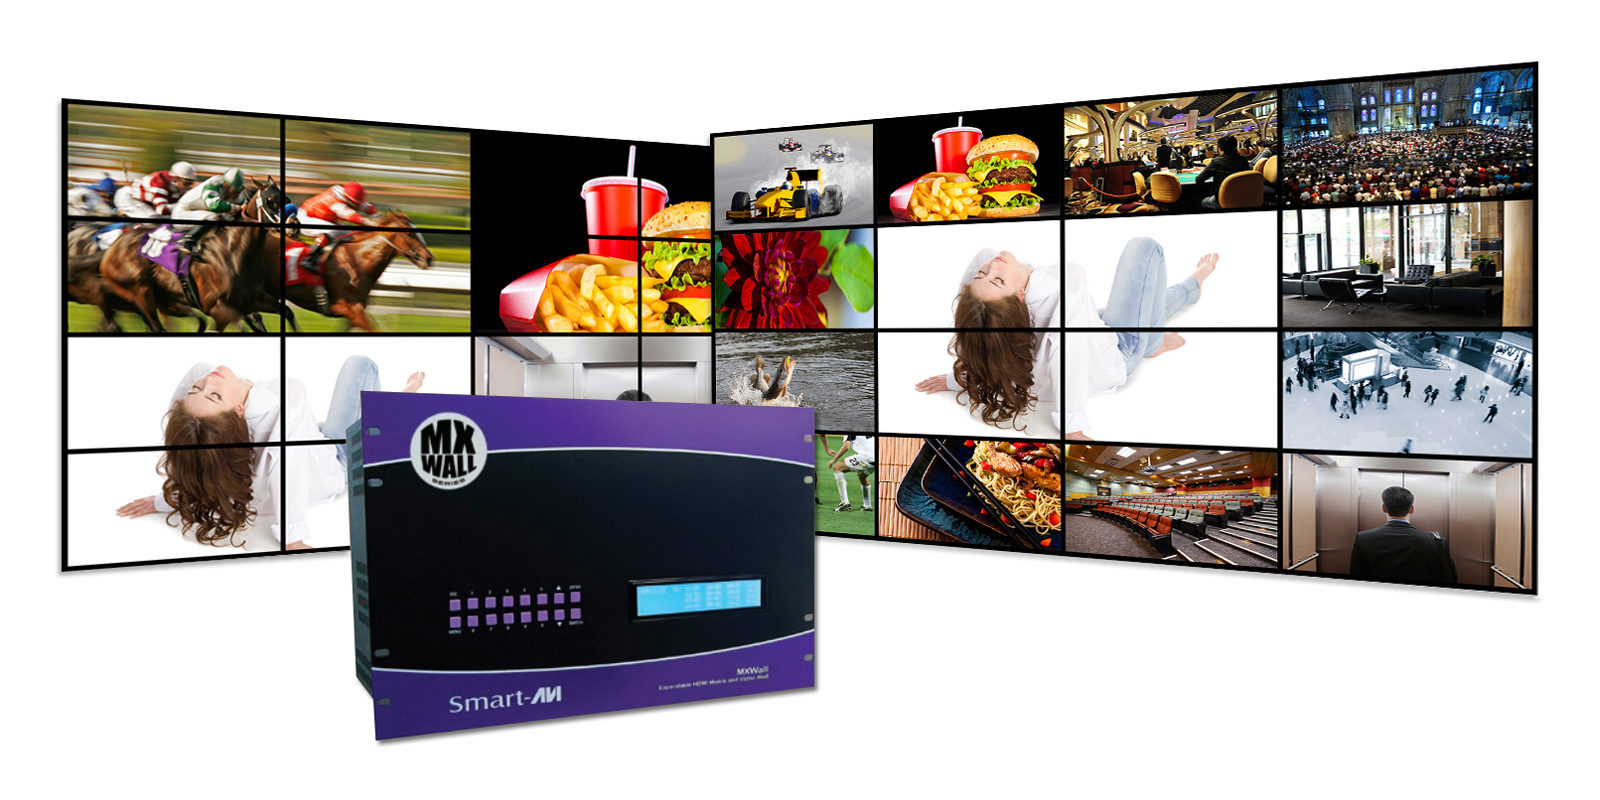 SmartAVI-MXWall 42u data center solutions most powerful video player SmartAVI Digital Signage